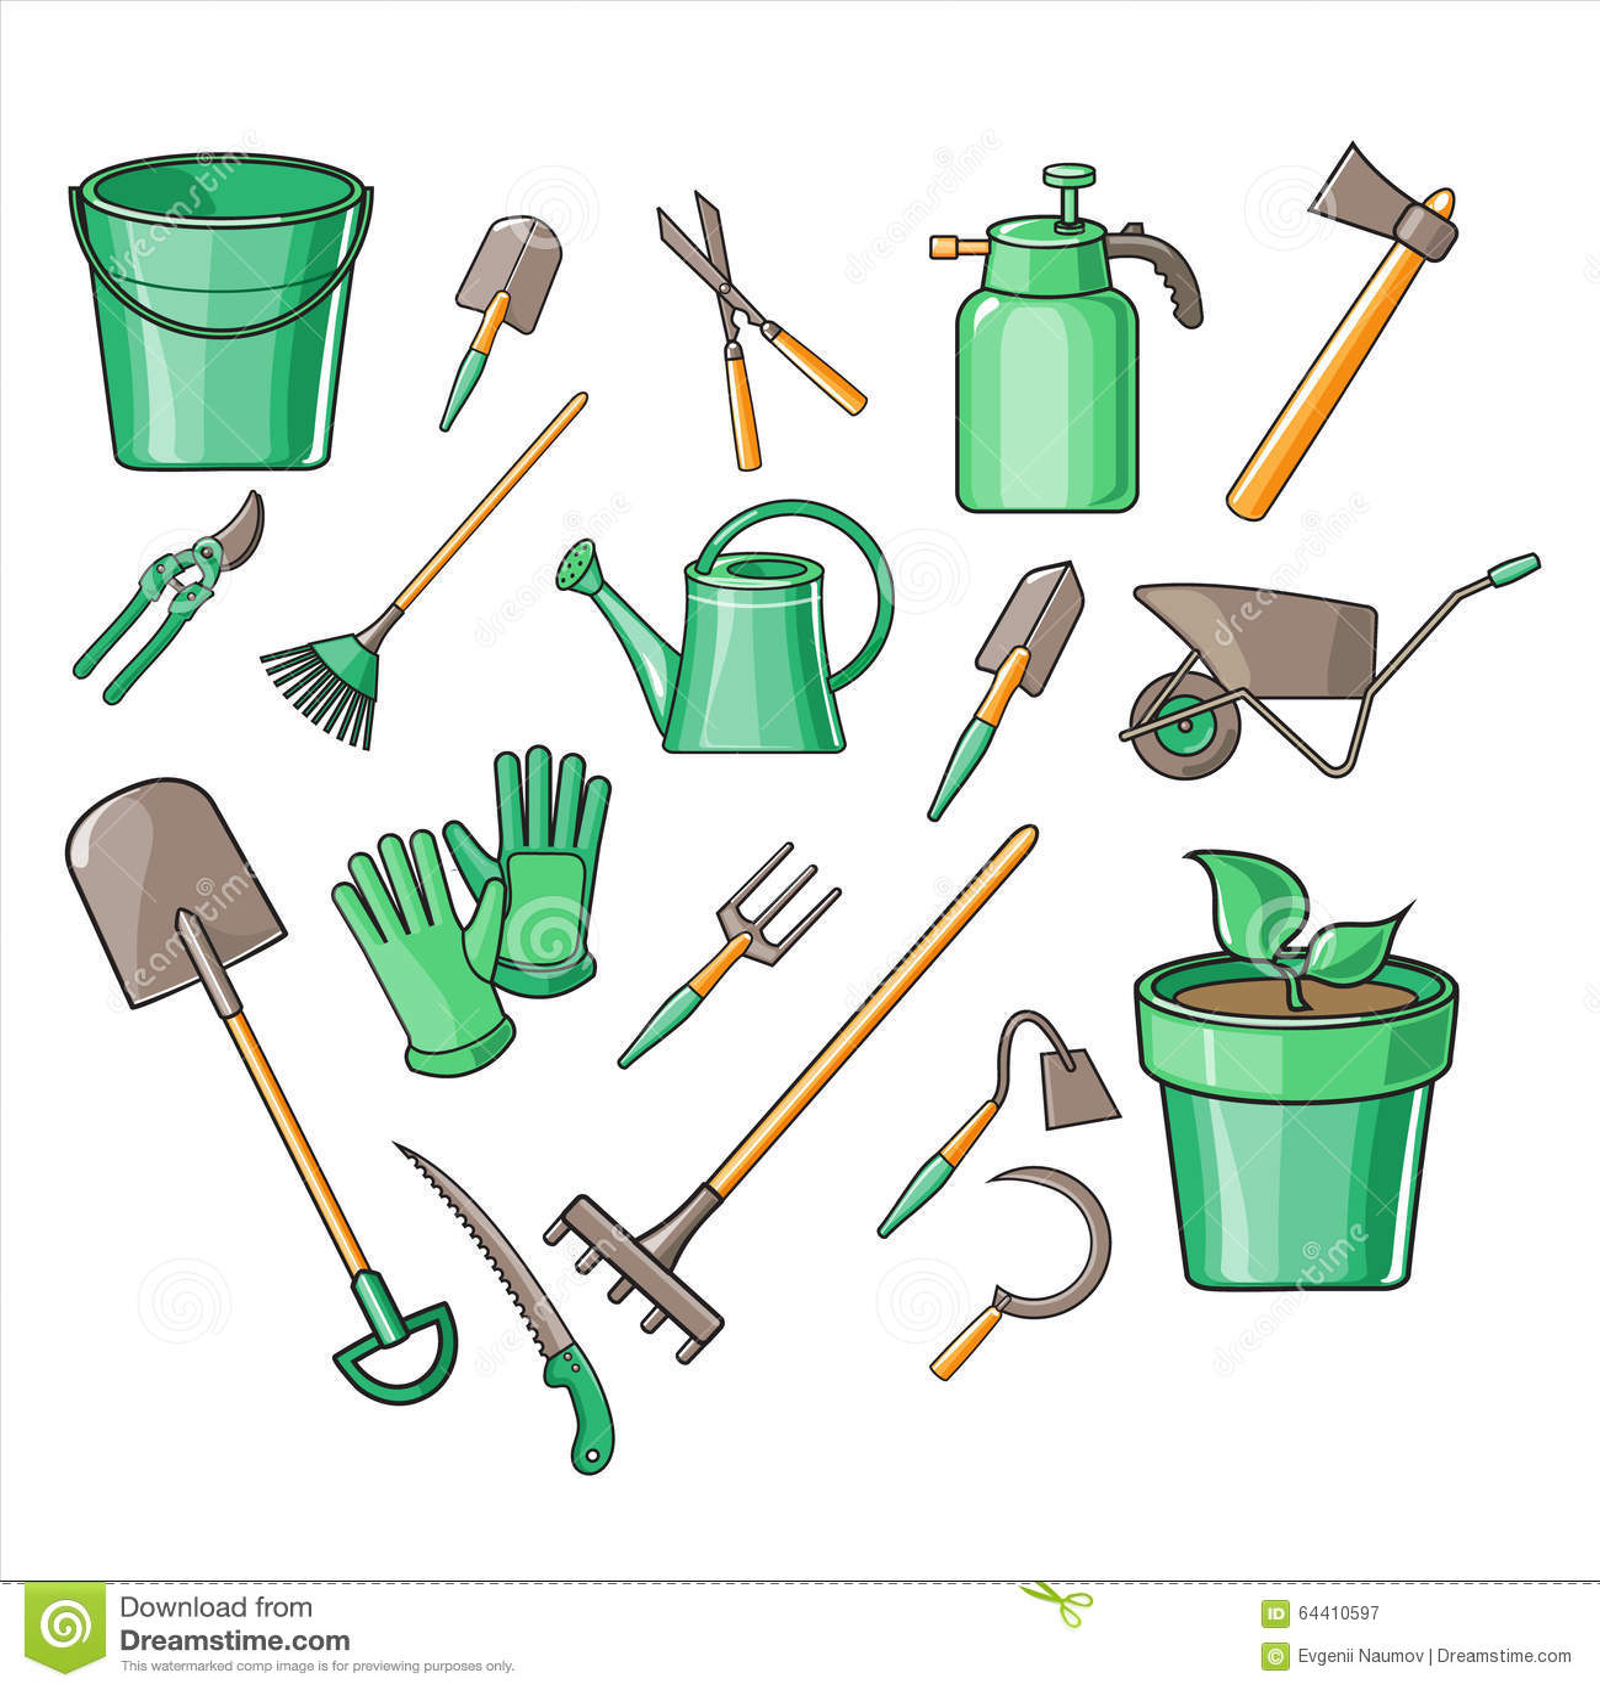 Gardening tools vector illustration set stock vector for Gardening tools vector